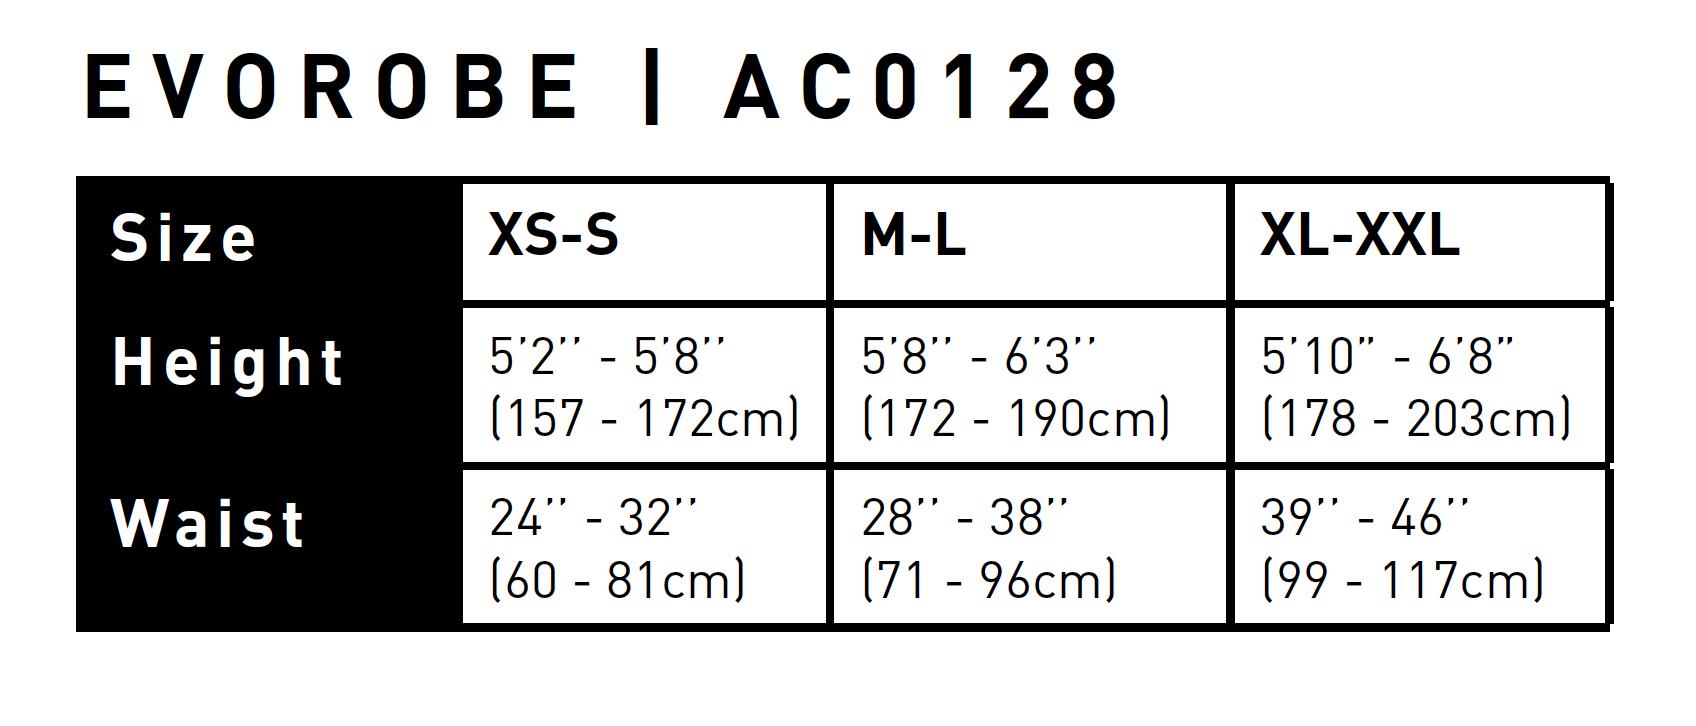 Gul EvoRobe Adult Size 2021 0 Size Chart